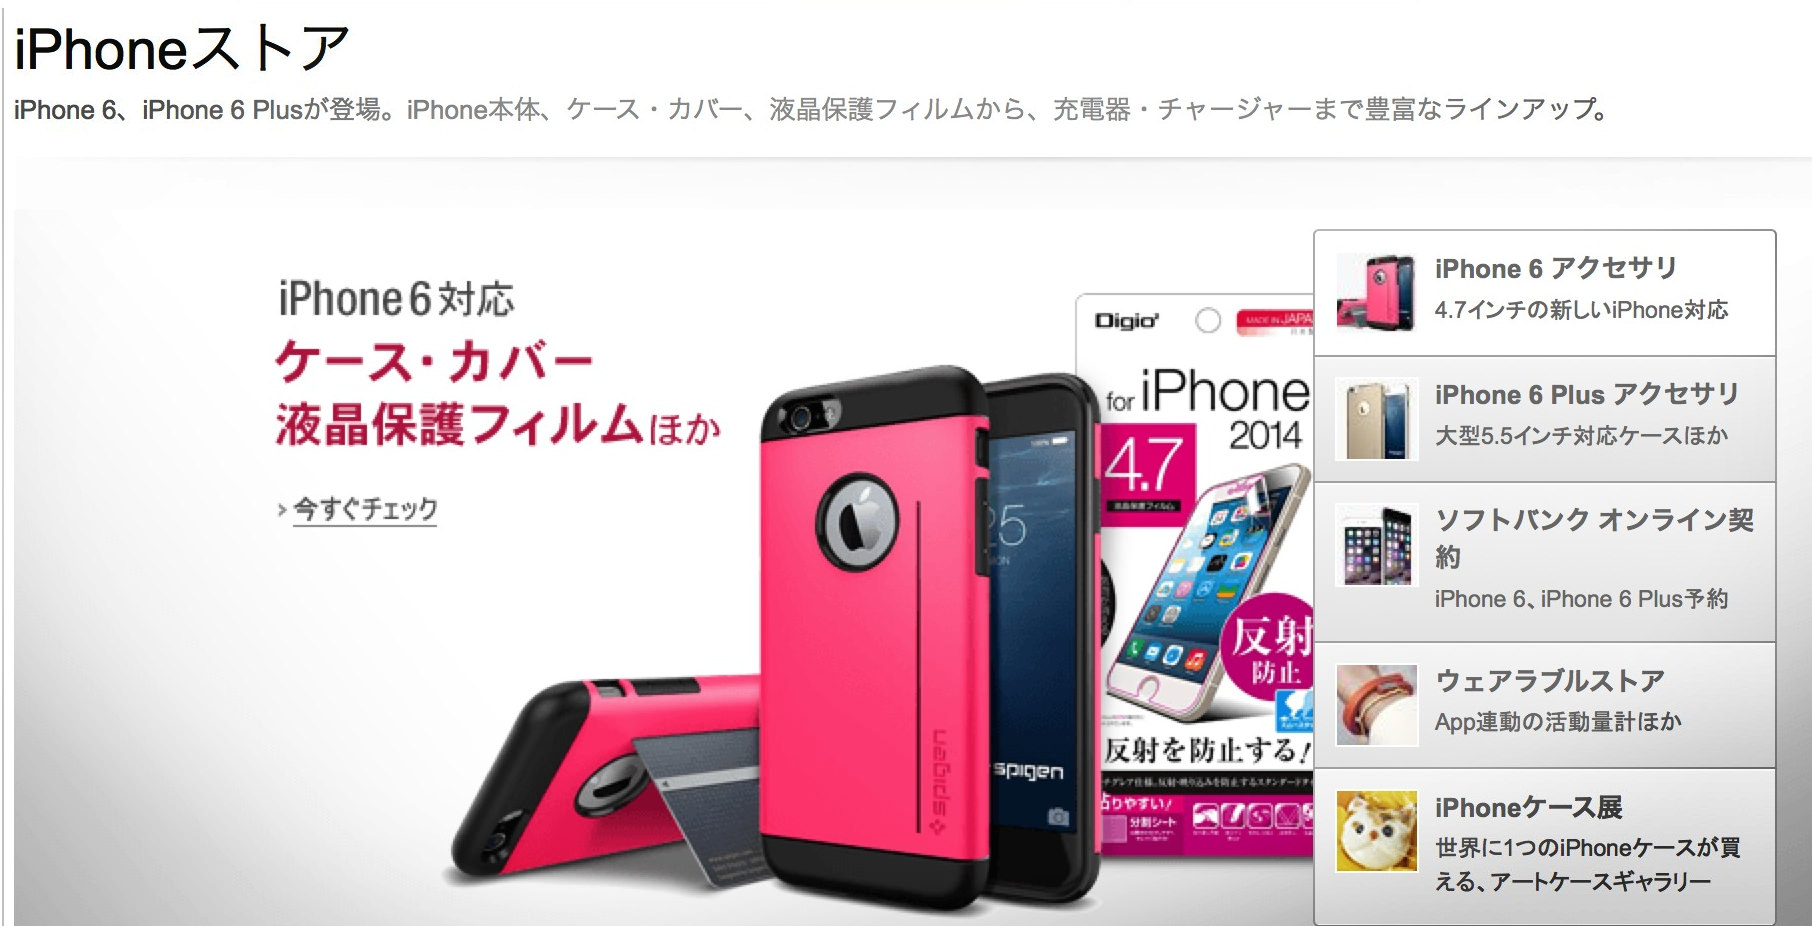 iPhone6 6Plus用のケース・保護フィルム